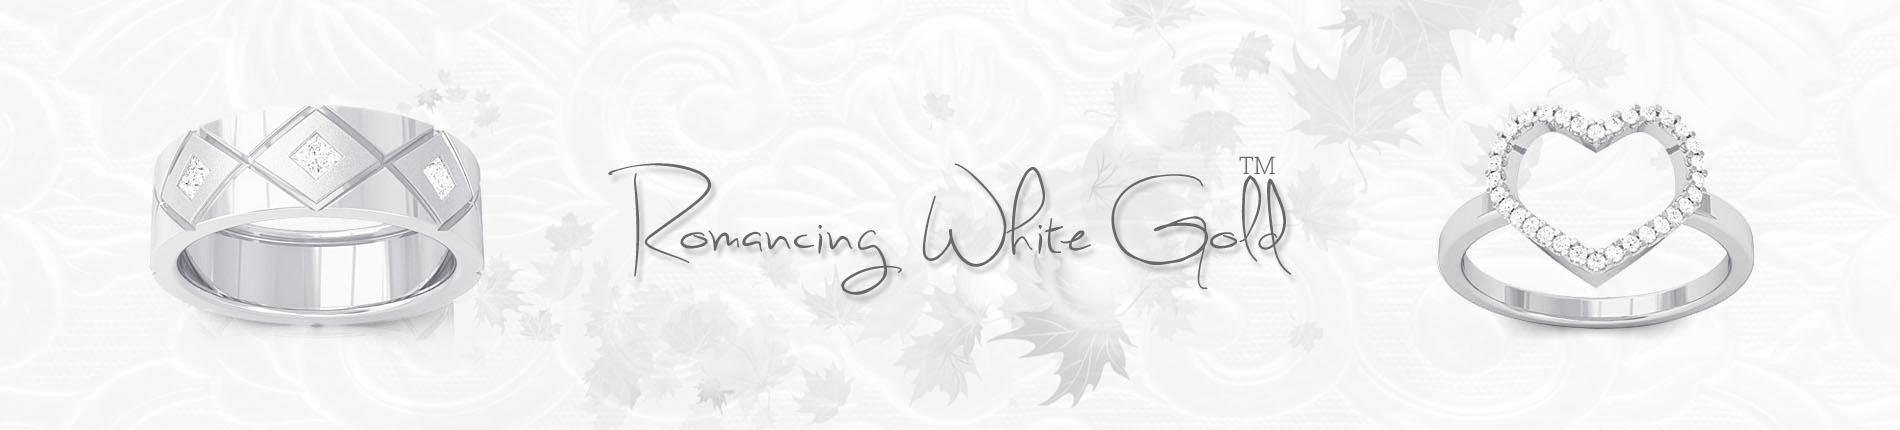 Kreeli Romancing White Gold